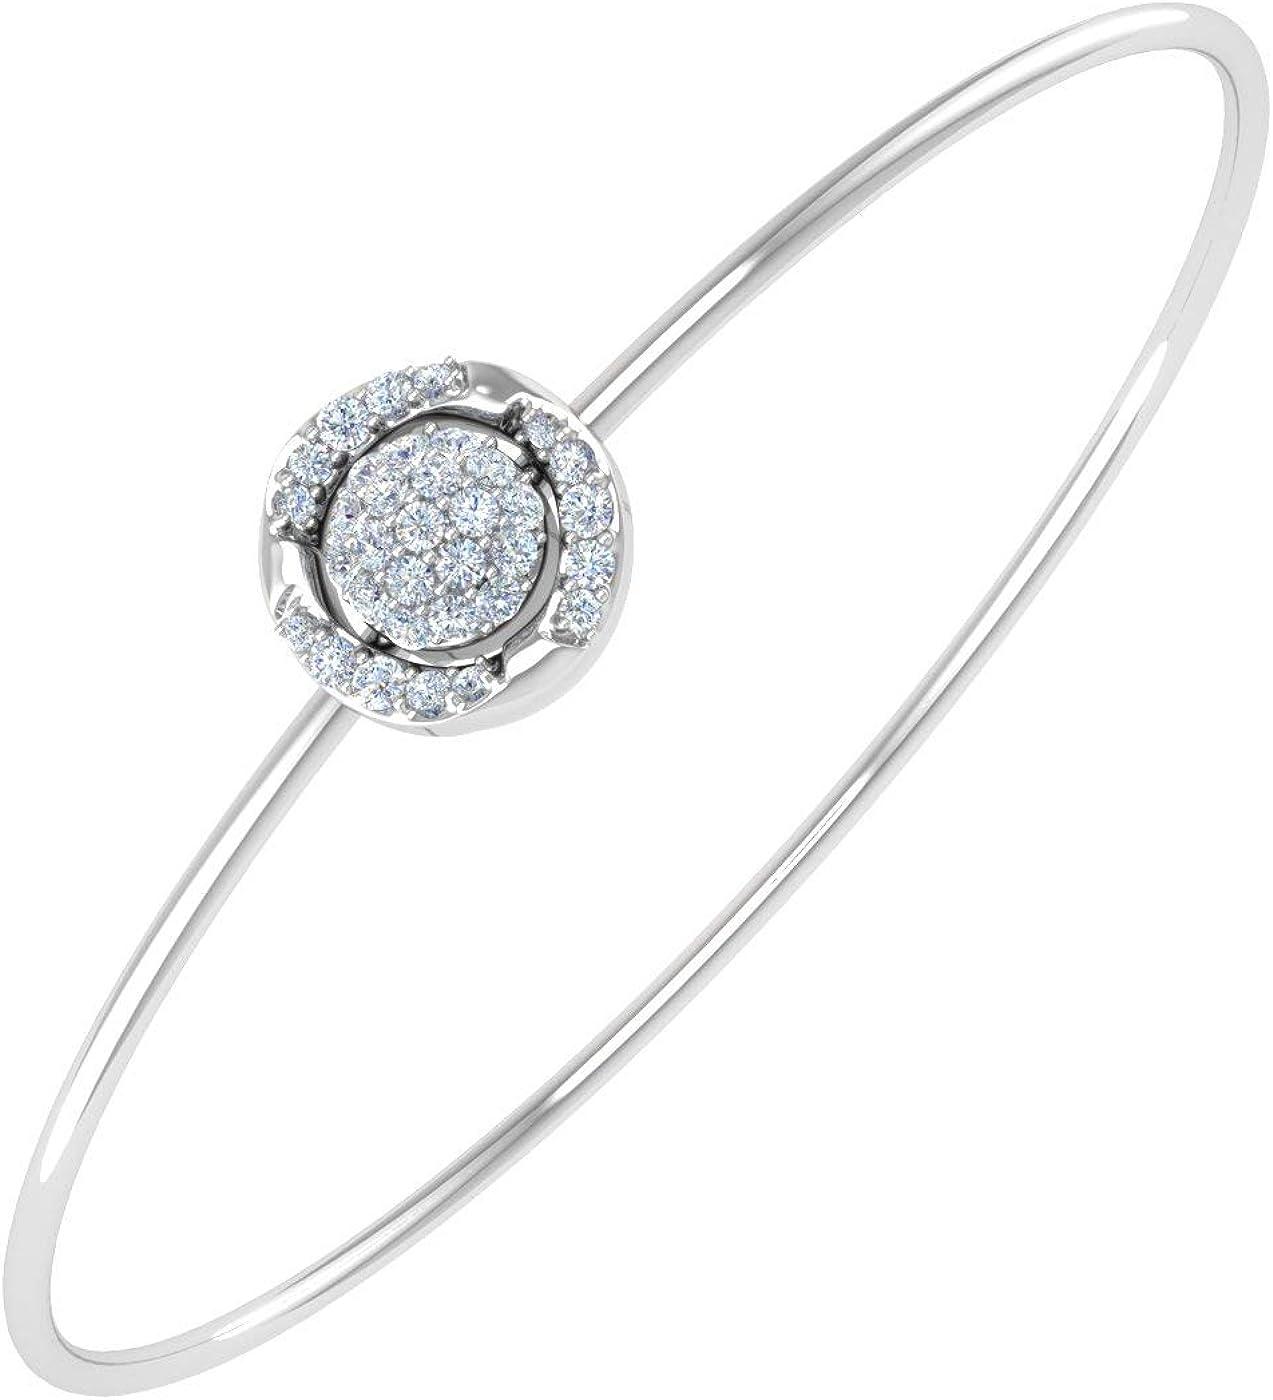 1/4 Carat Diamond Bangle Bracelet in 10K Gold and Steel